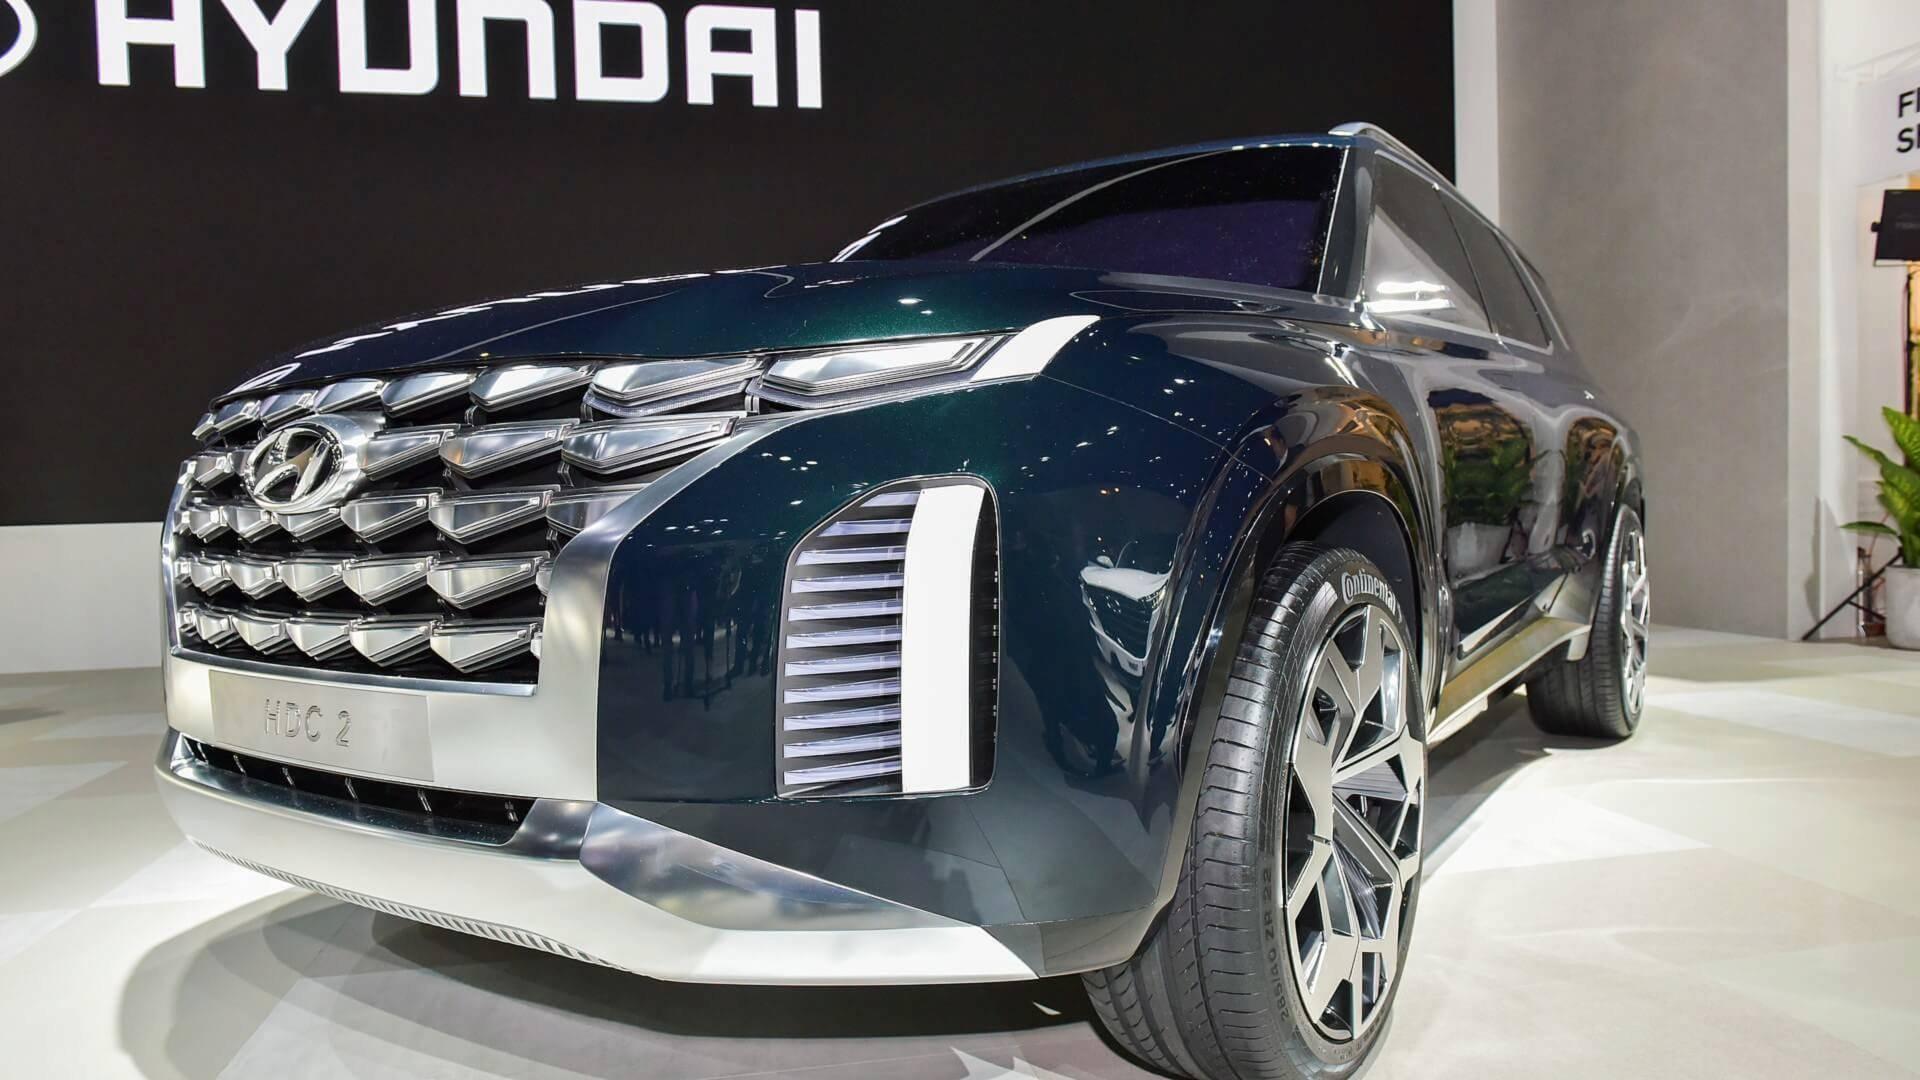 hyundai-hdc-2-grandmaster-concept-5 SUV-ul Hyundai se zvoneste a fi un concurent pentru Toyota Land Cruiser